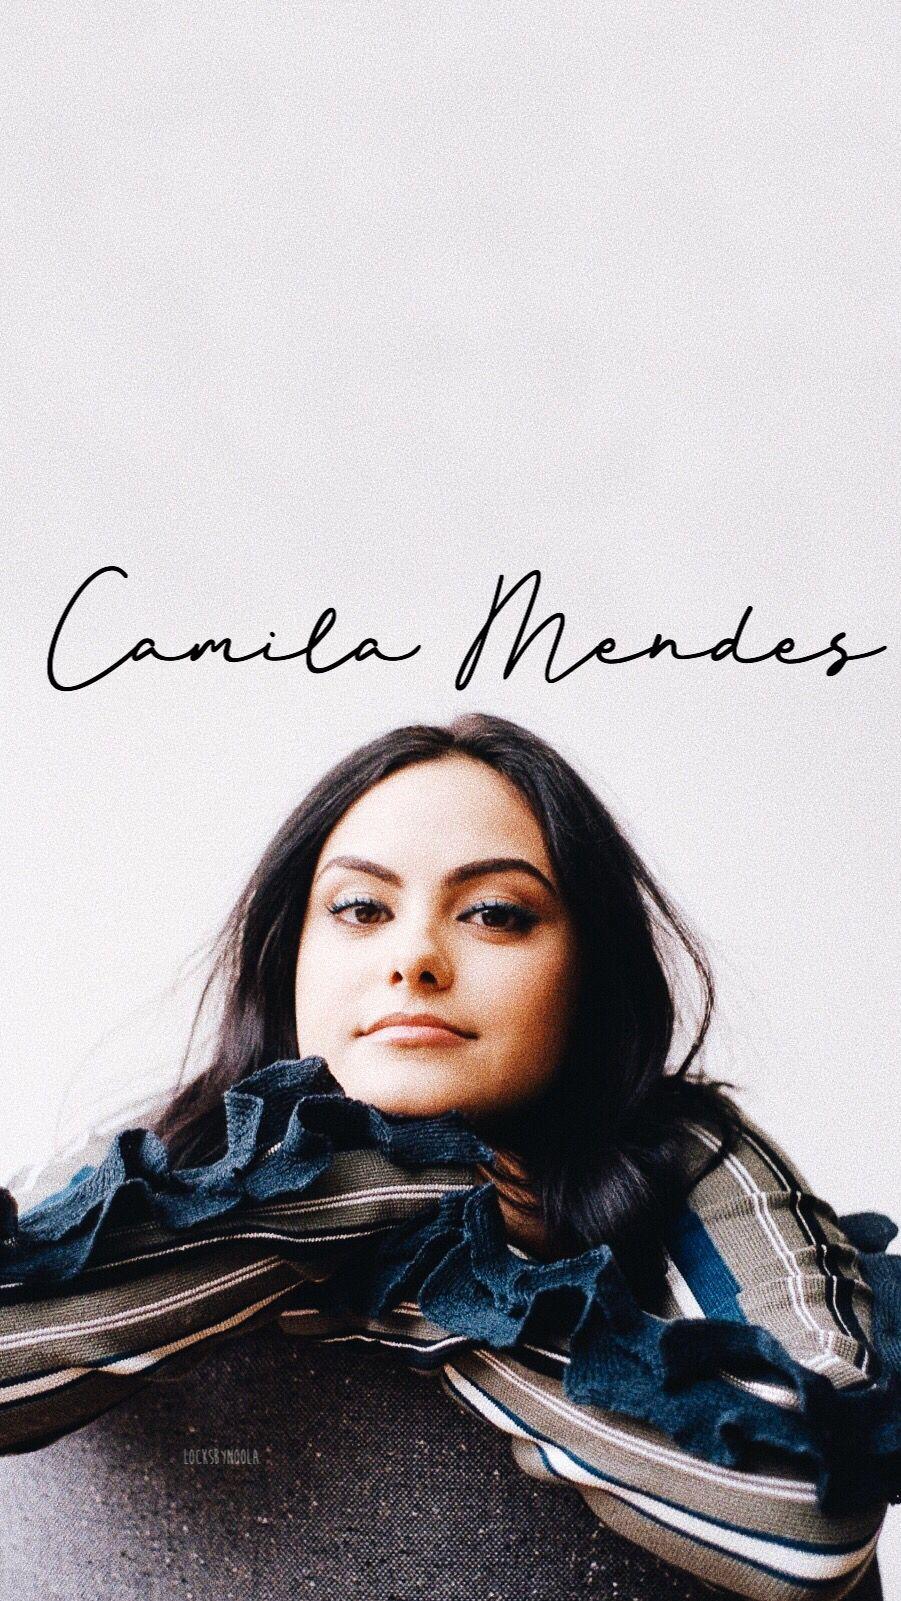 Camila Mendes Iphone Wallpaper Riverdale Veronica Riverdale Aesthetic Riverdale